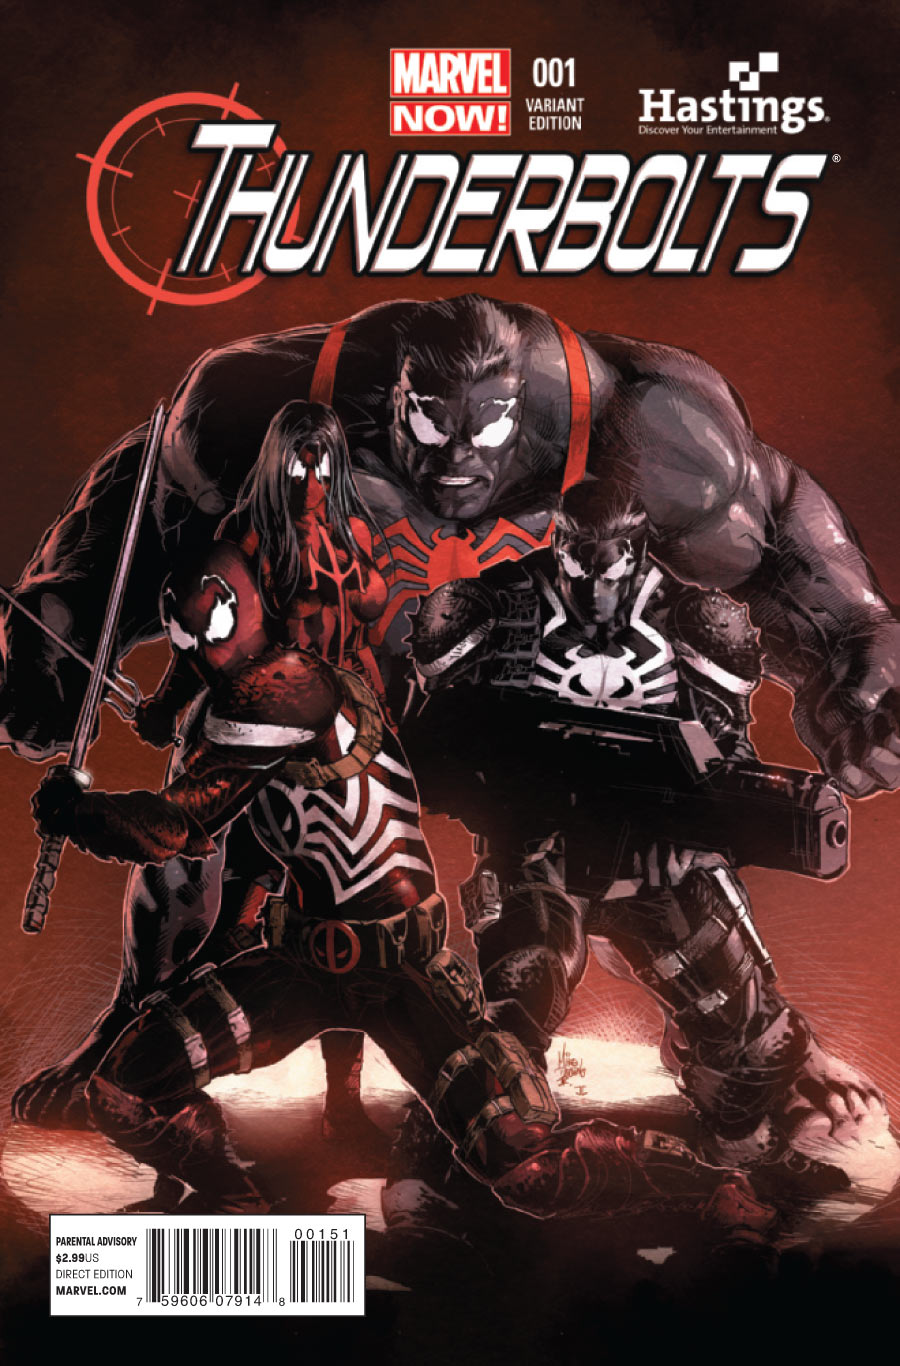 Thunderbolts Vol 2 1 Hastings Variant